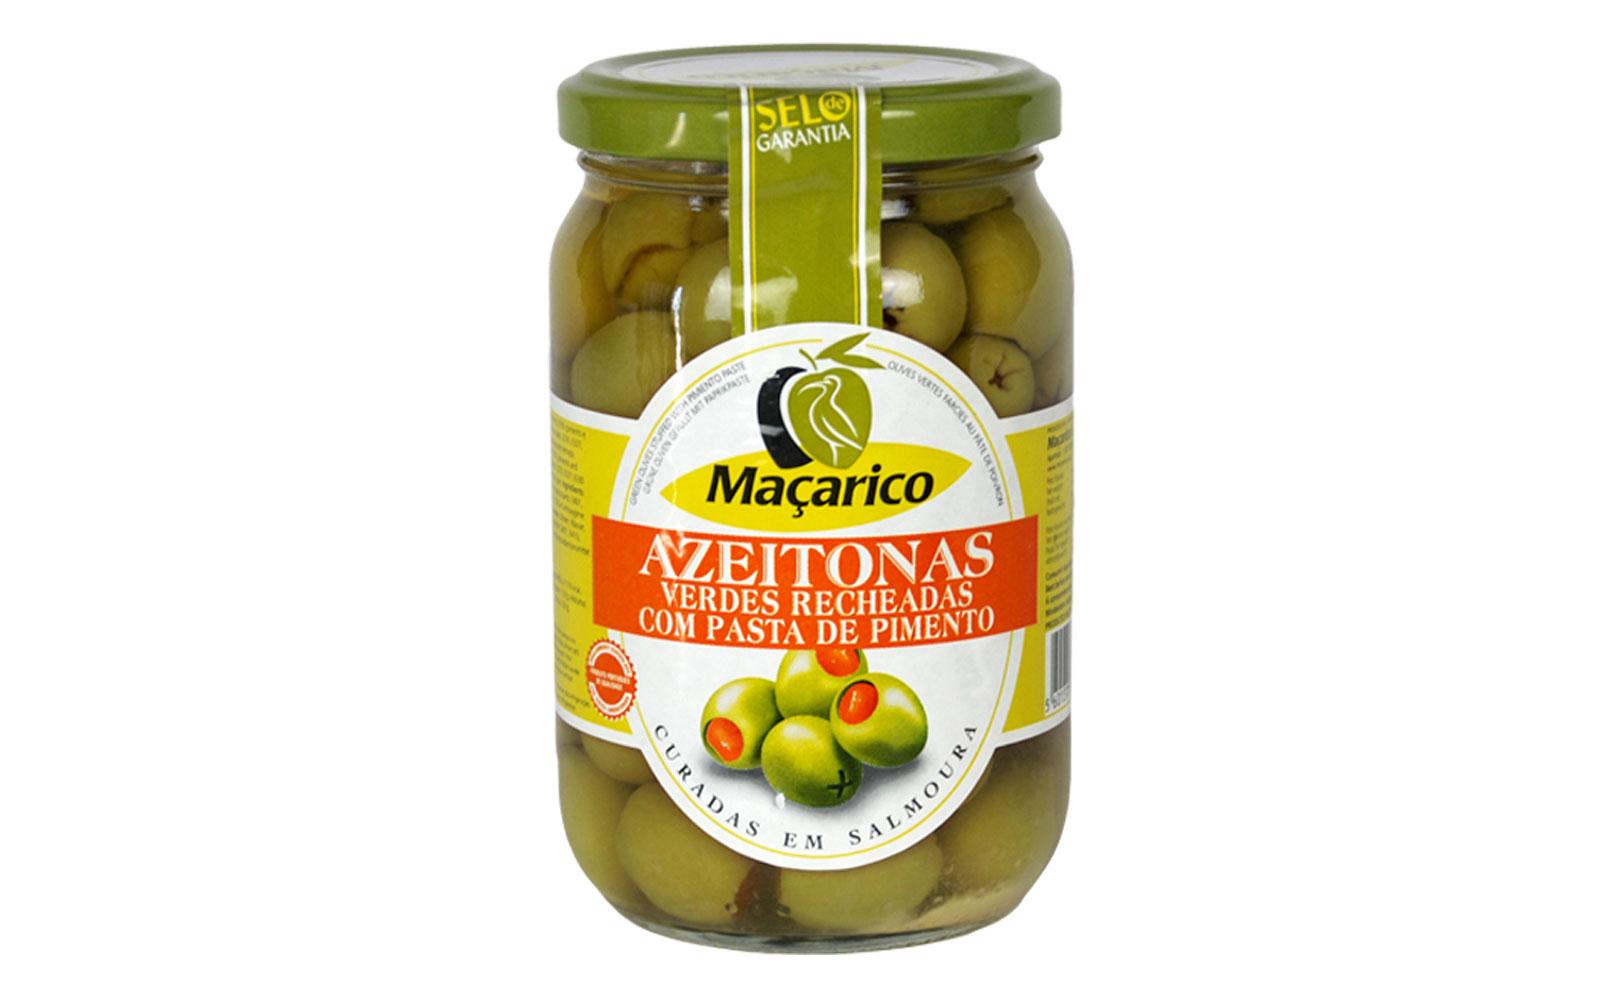 macarico verdes recheadas pasta pimento 200